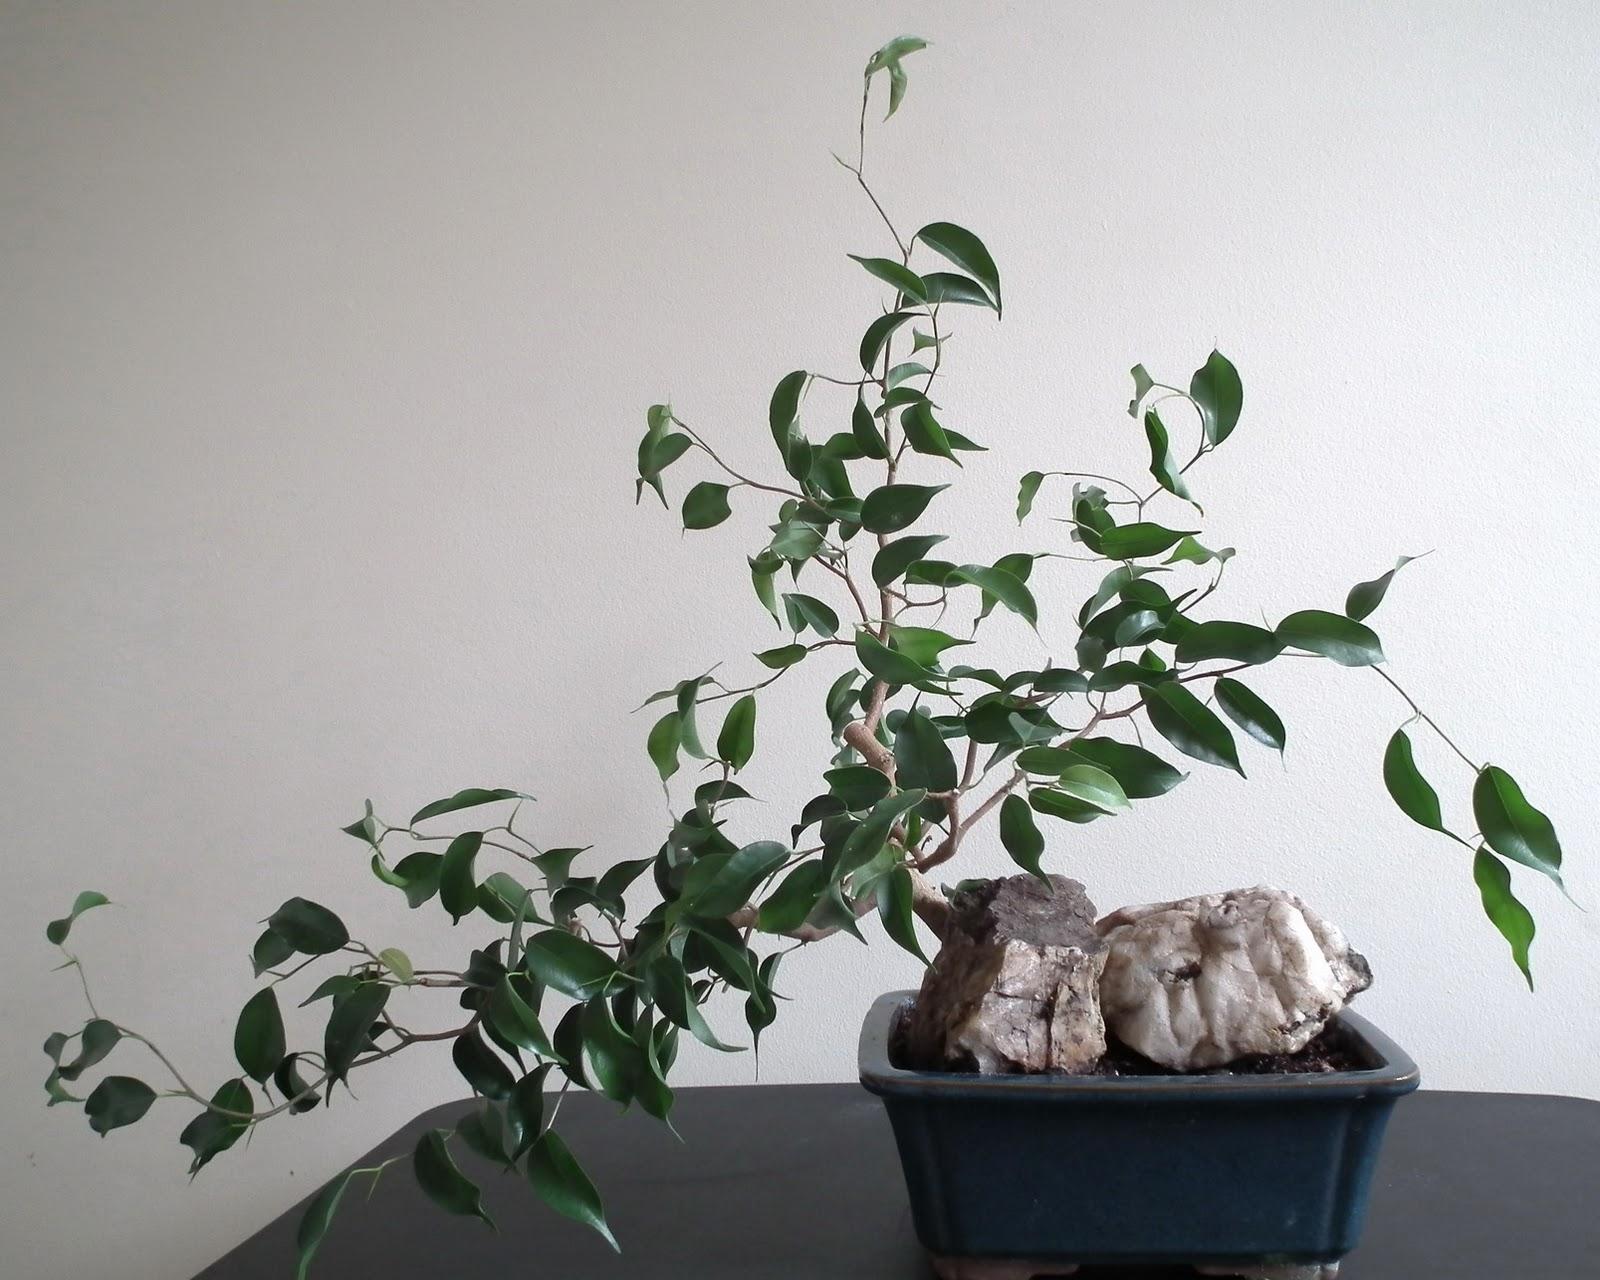 Scented Leaf Ficus Wiandi Air Purifying Bonsai